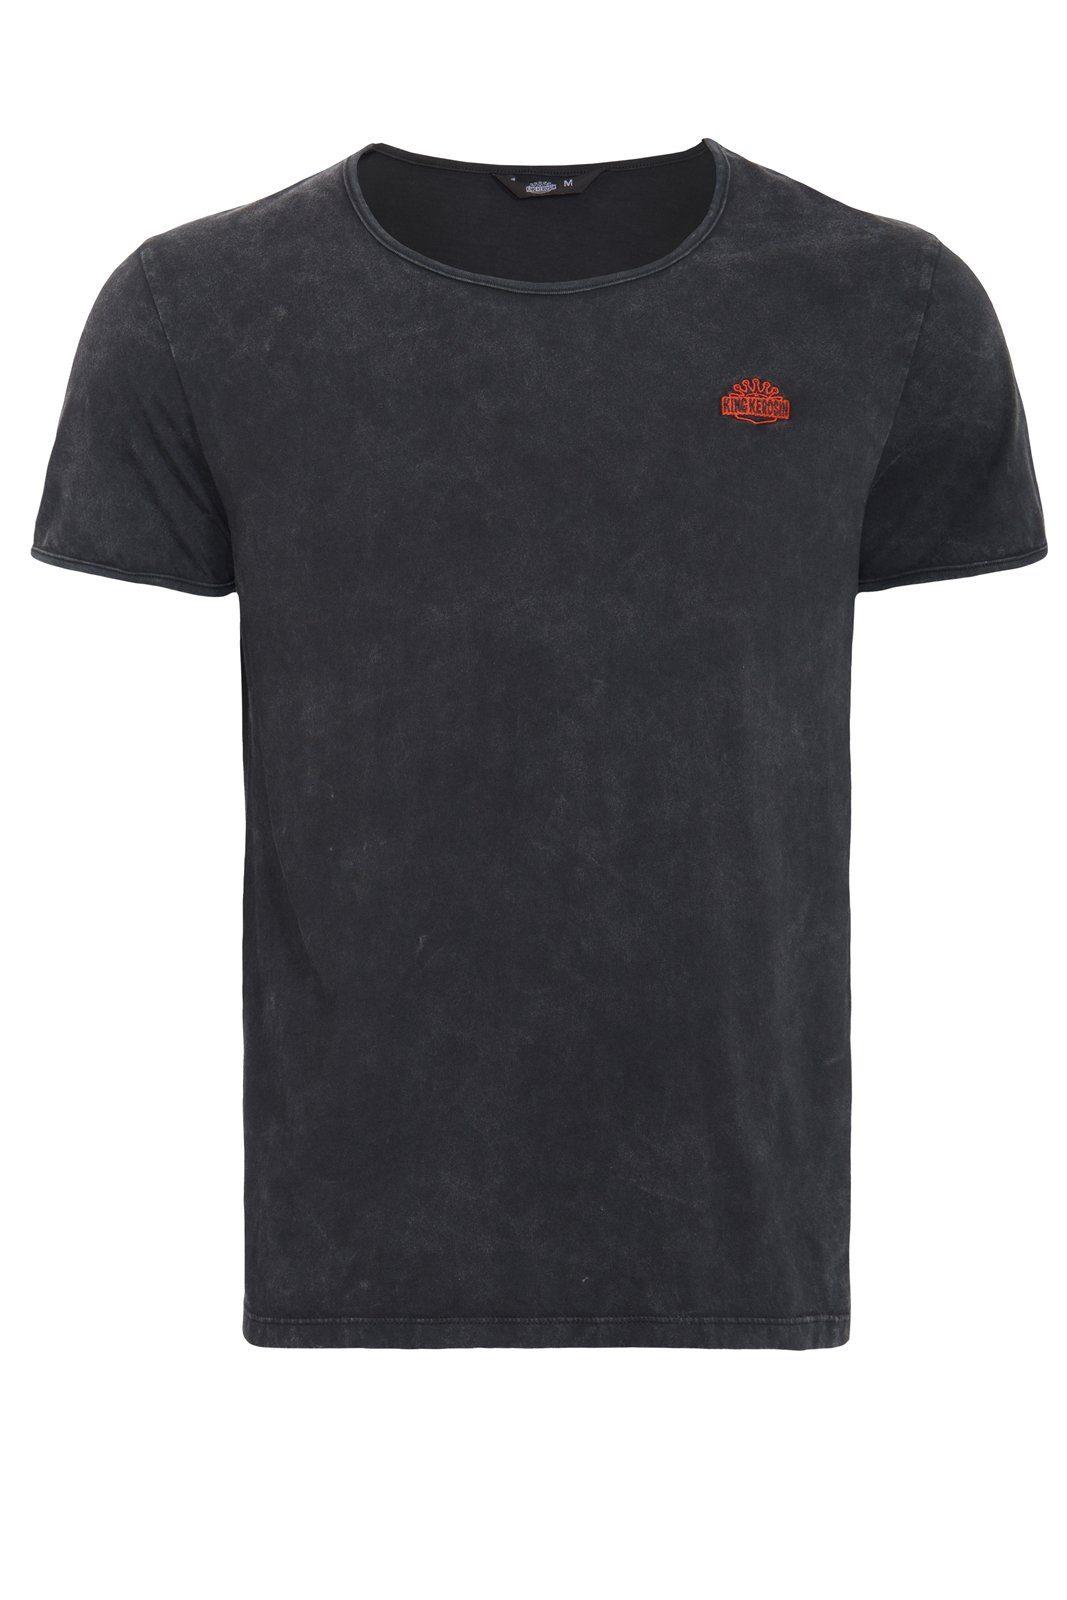 KingKerosin T-Shirt | Bekleidung > Shirts > Sonstige Shirts | Schwarz | Baumwolle | KINGKEROSIN